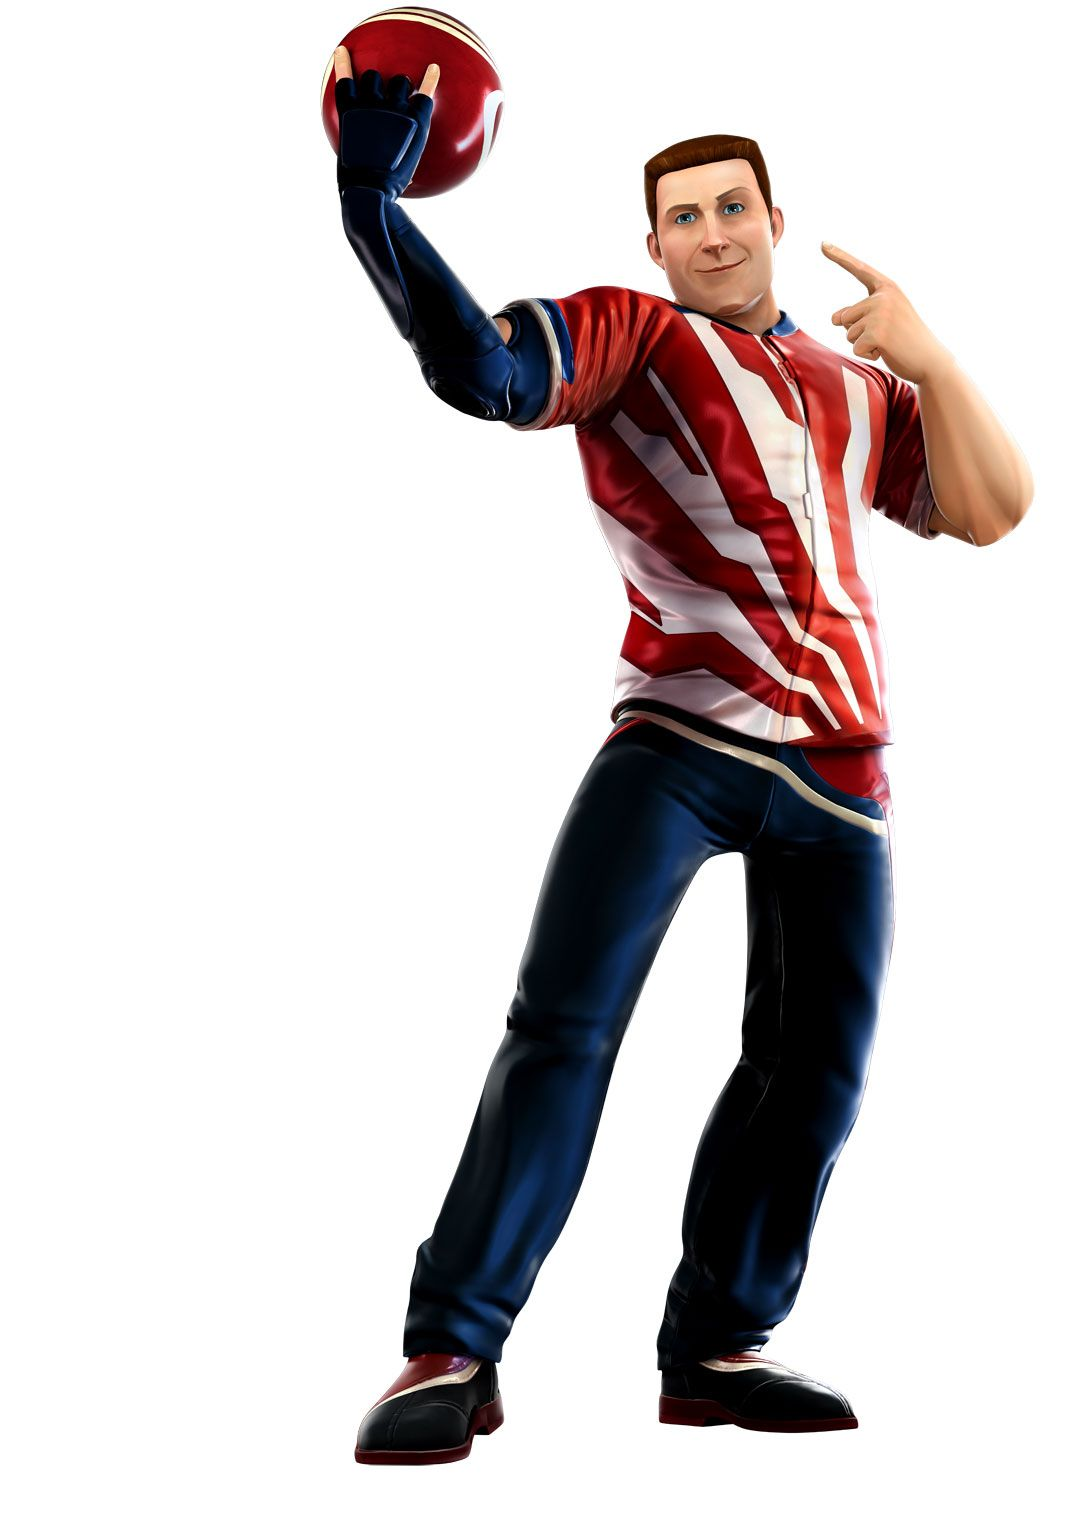 A male KSR Bowling Champion Champion, Sports, Bowling